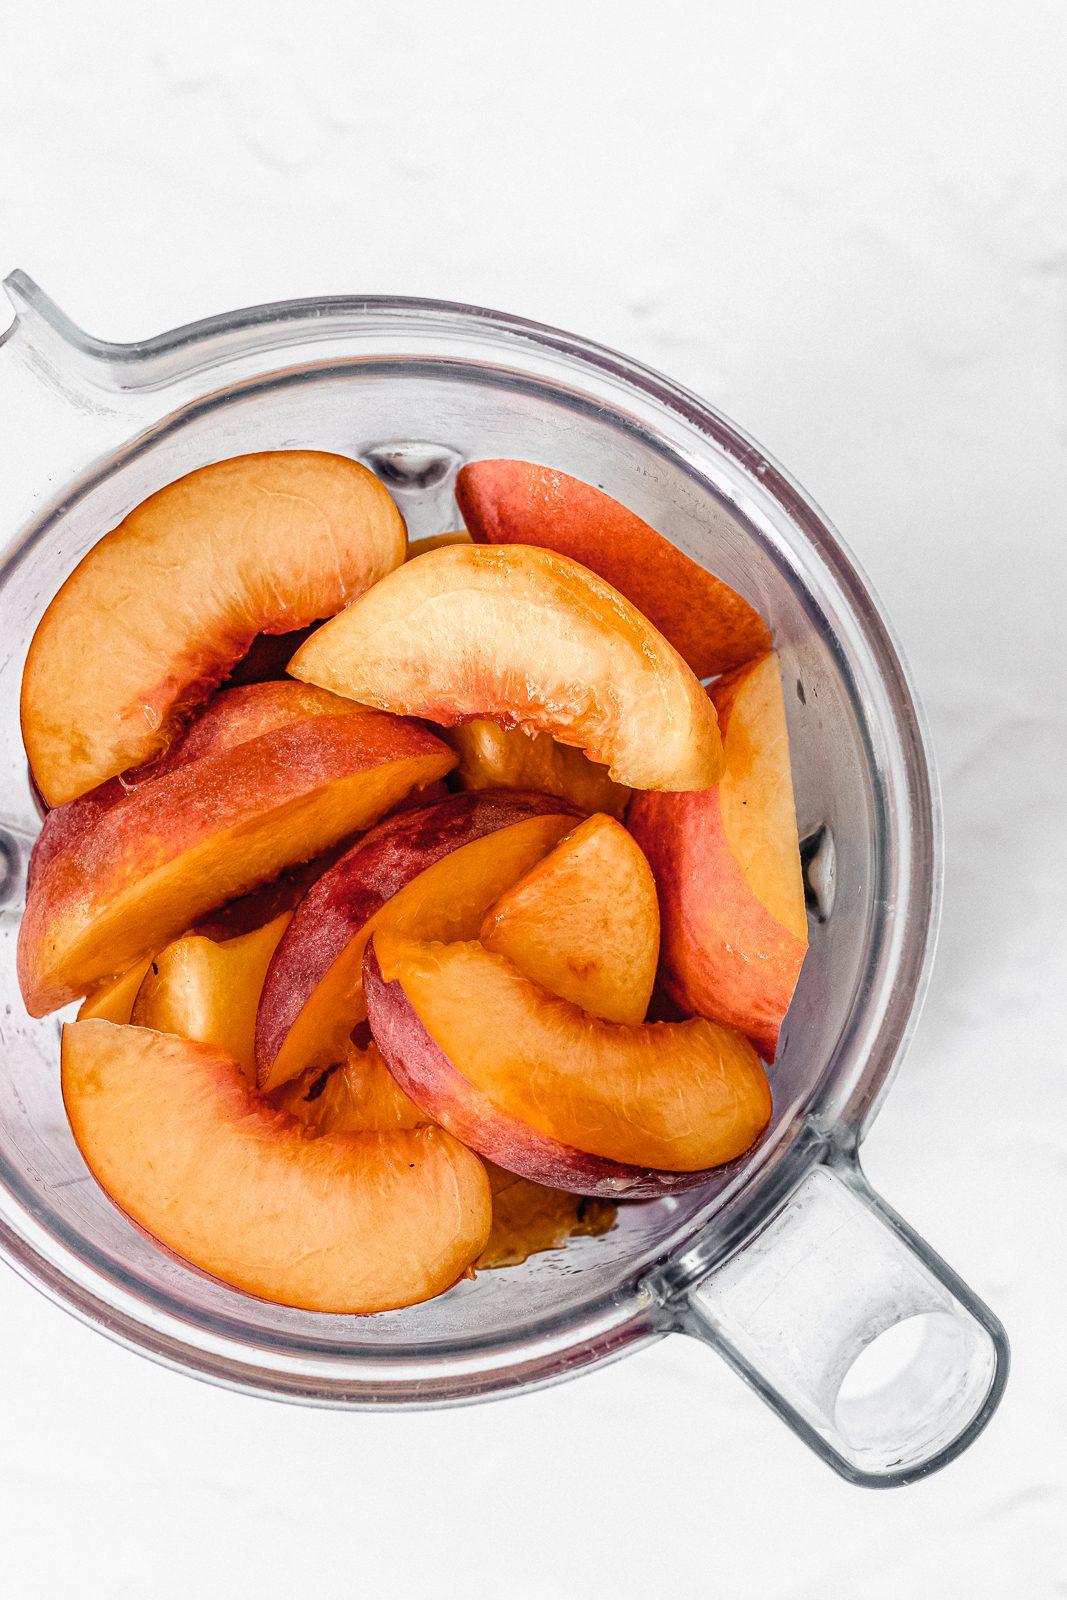 Adult Popsicle Recipe, Peach Jalapeño Popsicles